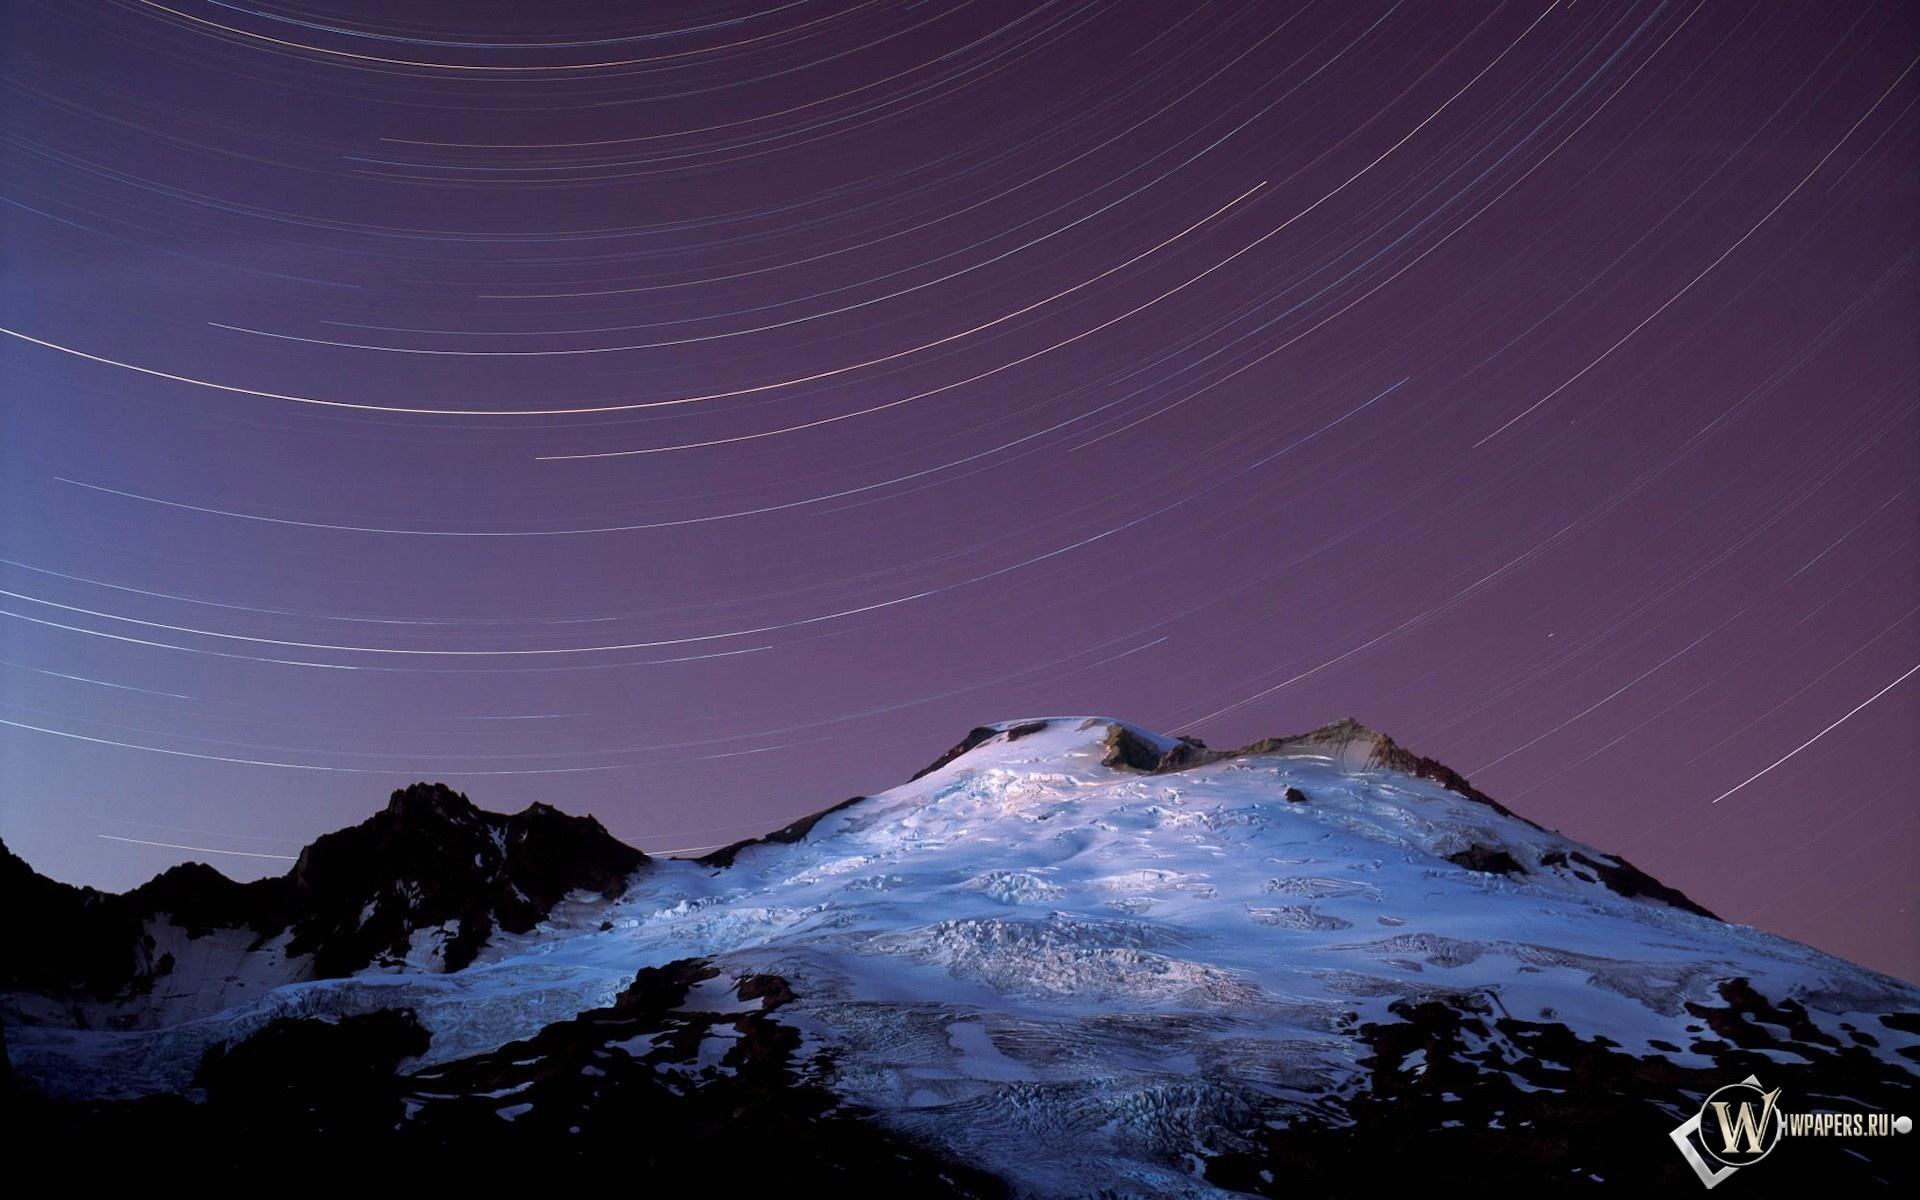 Ночь на горе 1920x1200